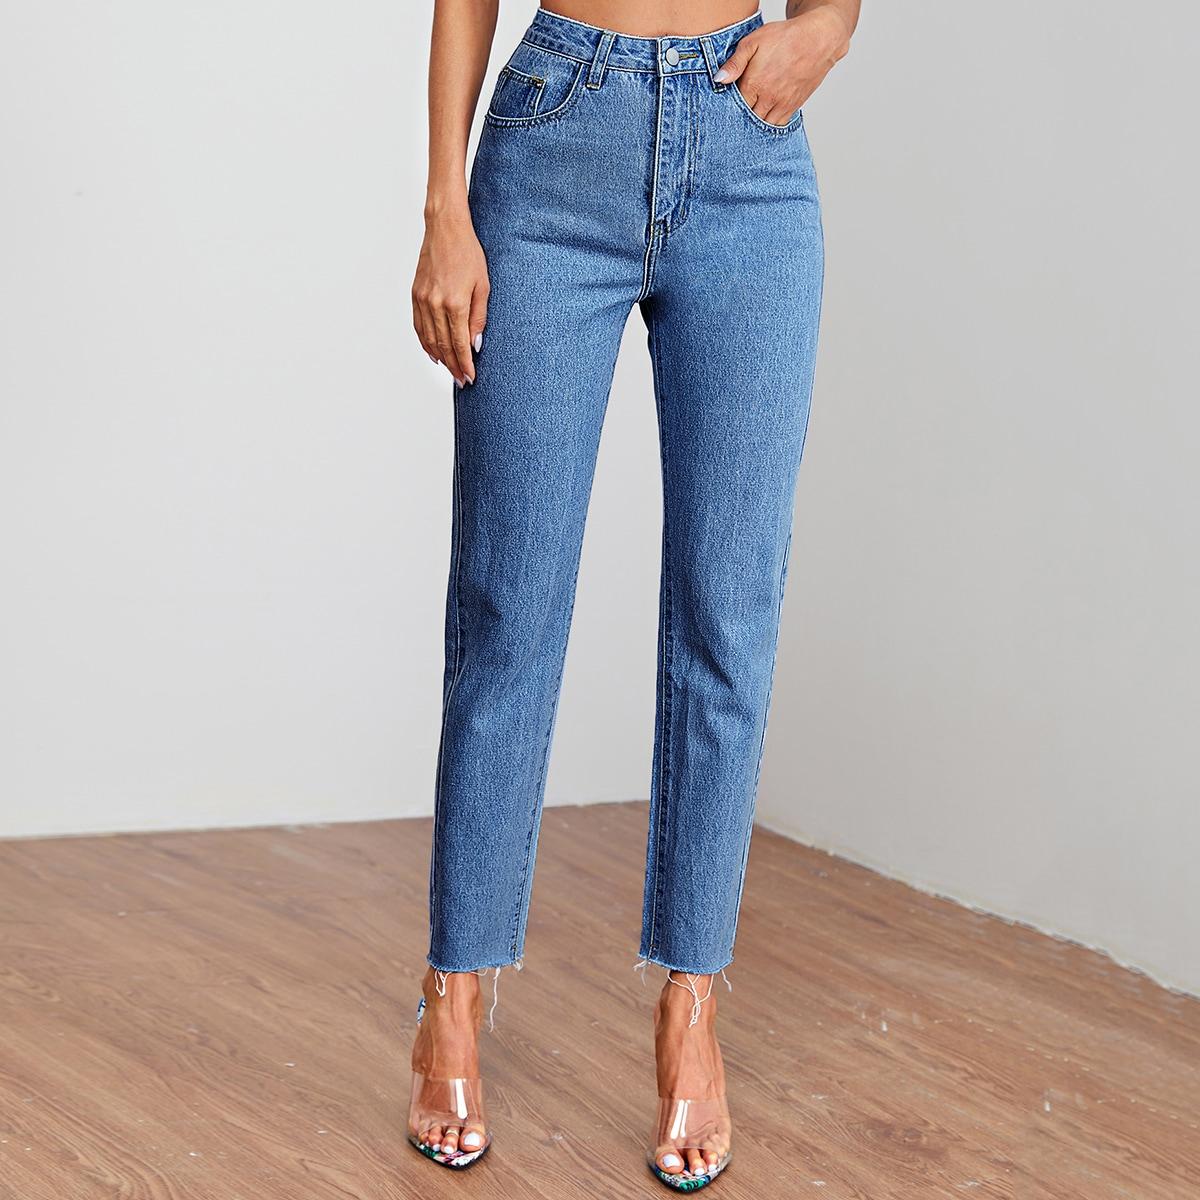 Frayed Raw-Cut High Waisted Jeans